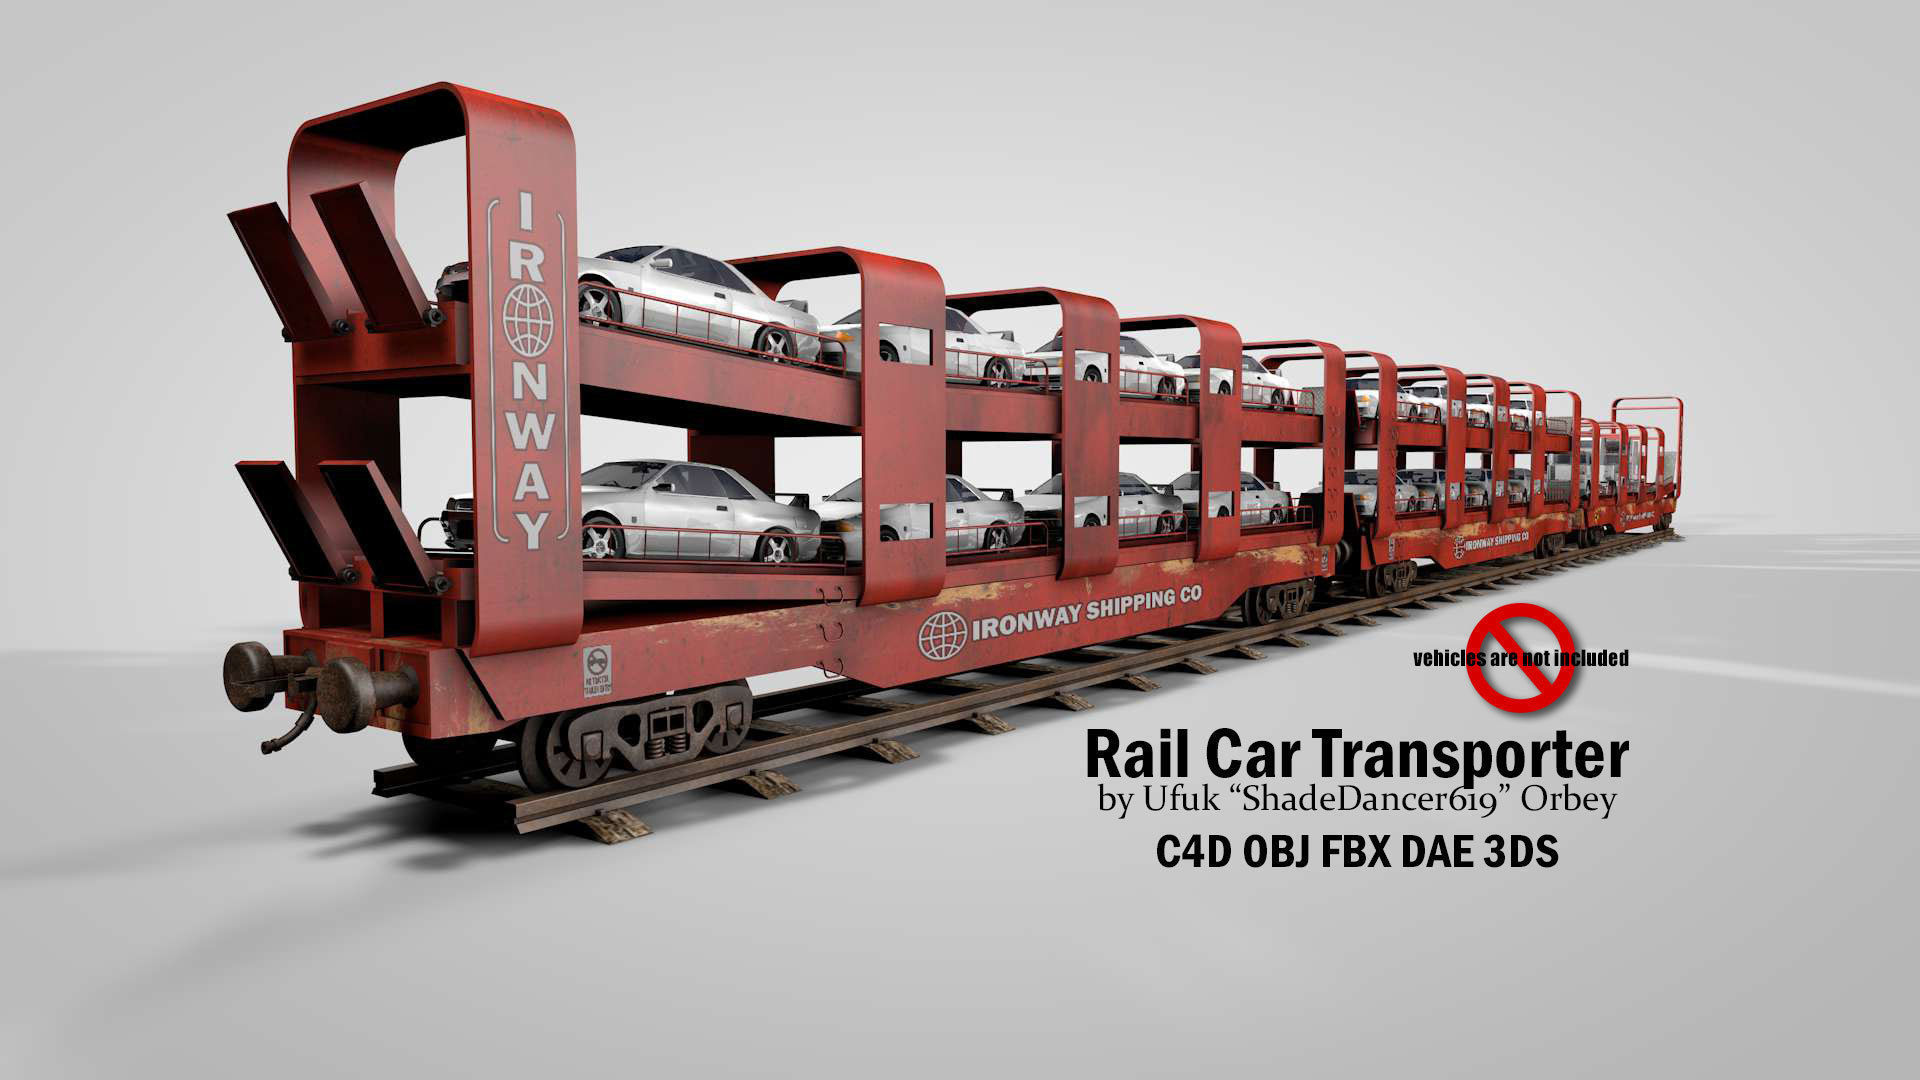 Rail транспортер 1 конвейер в мире